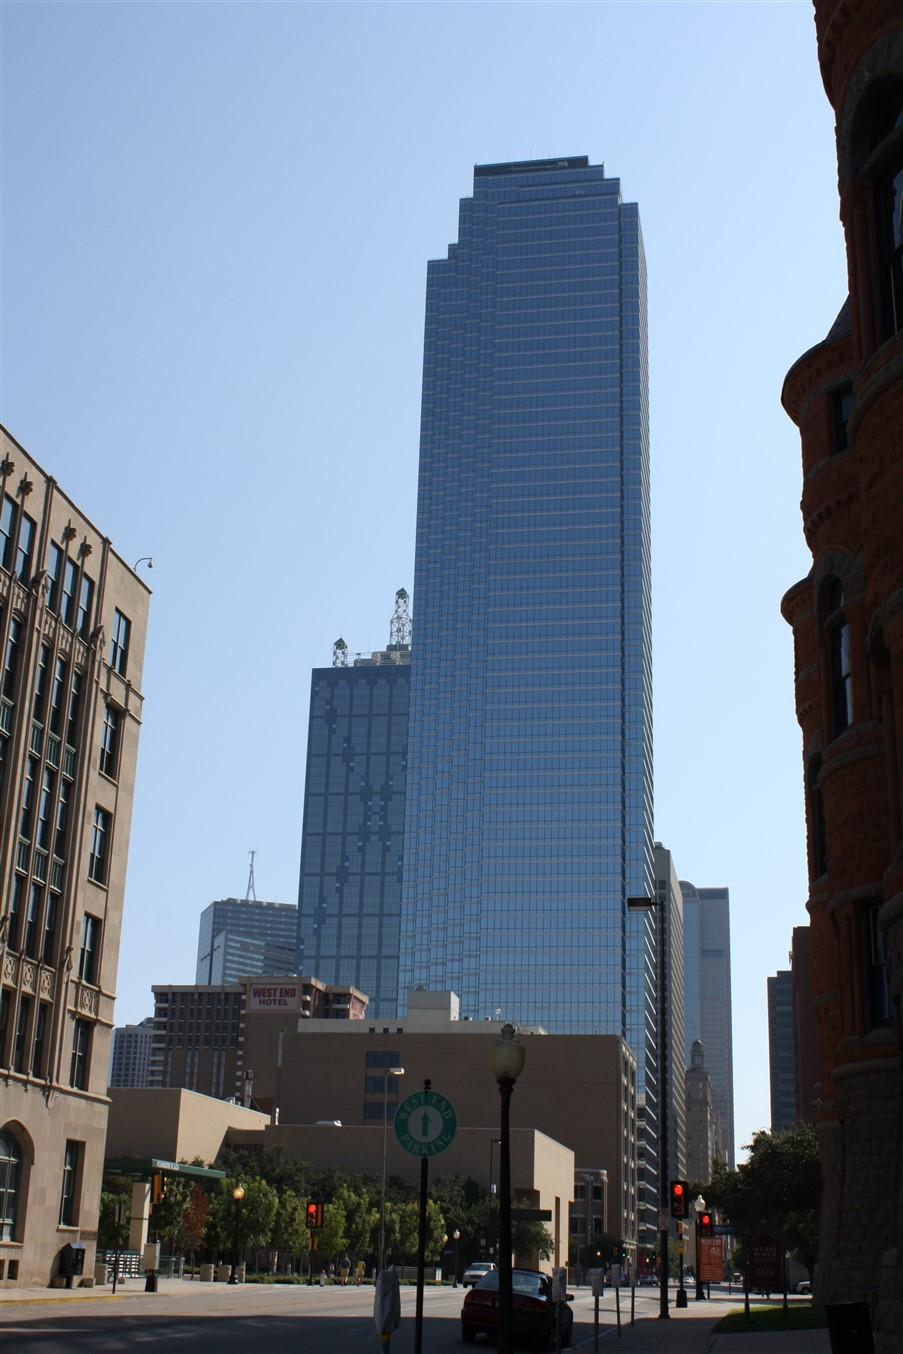 2009 08 30 4 Dallas.jpg